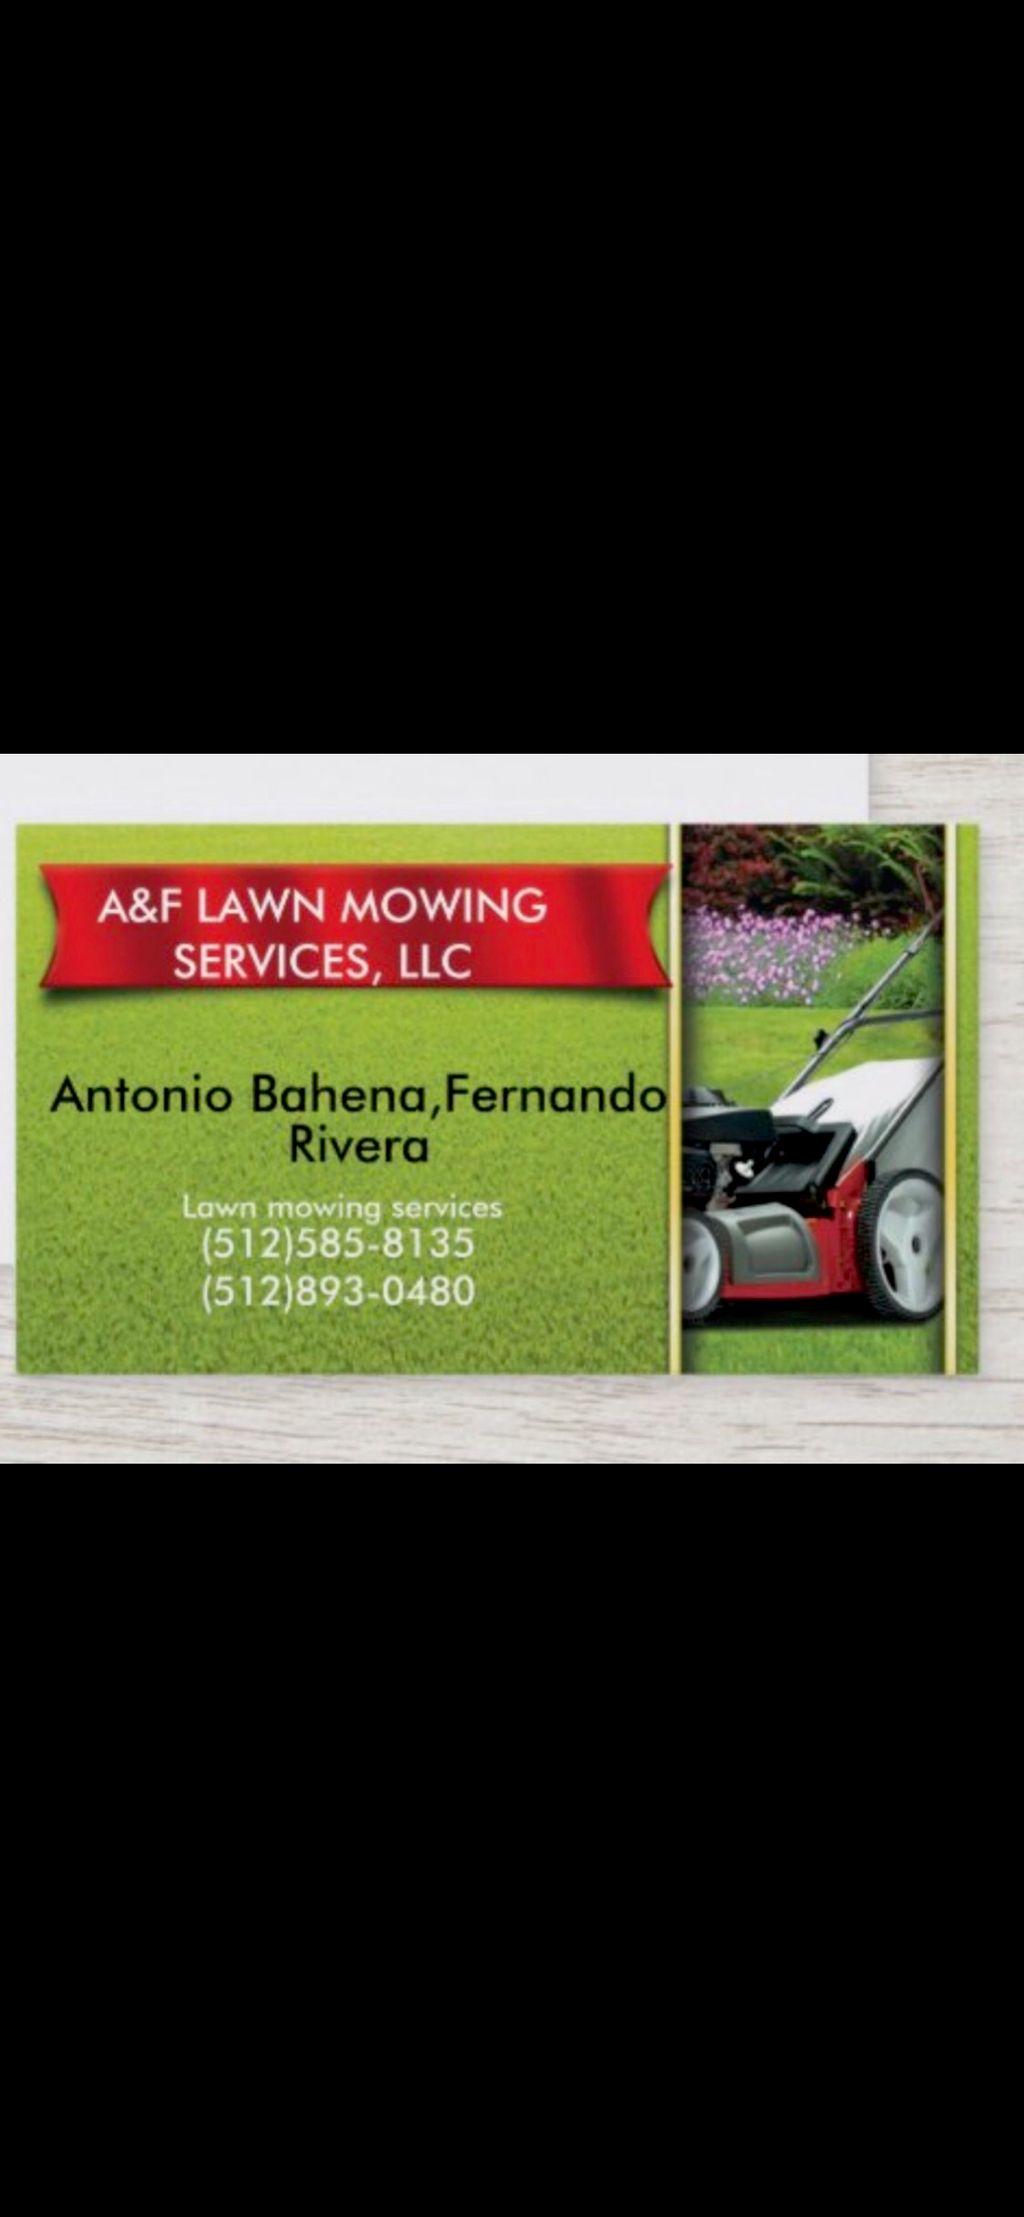 A&F Lawn Mowing Services, LLC